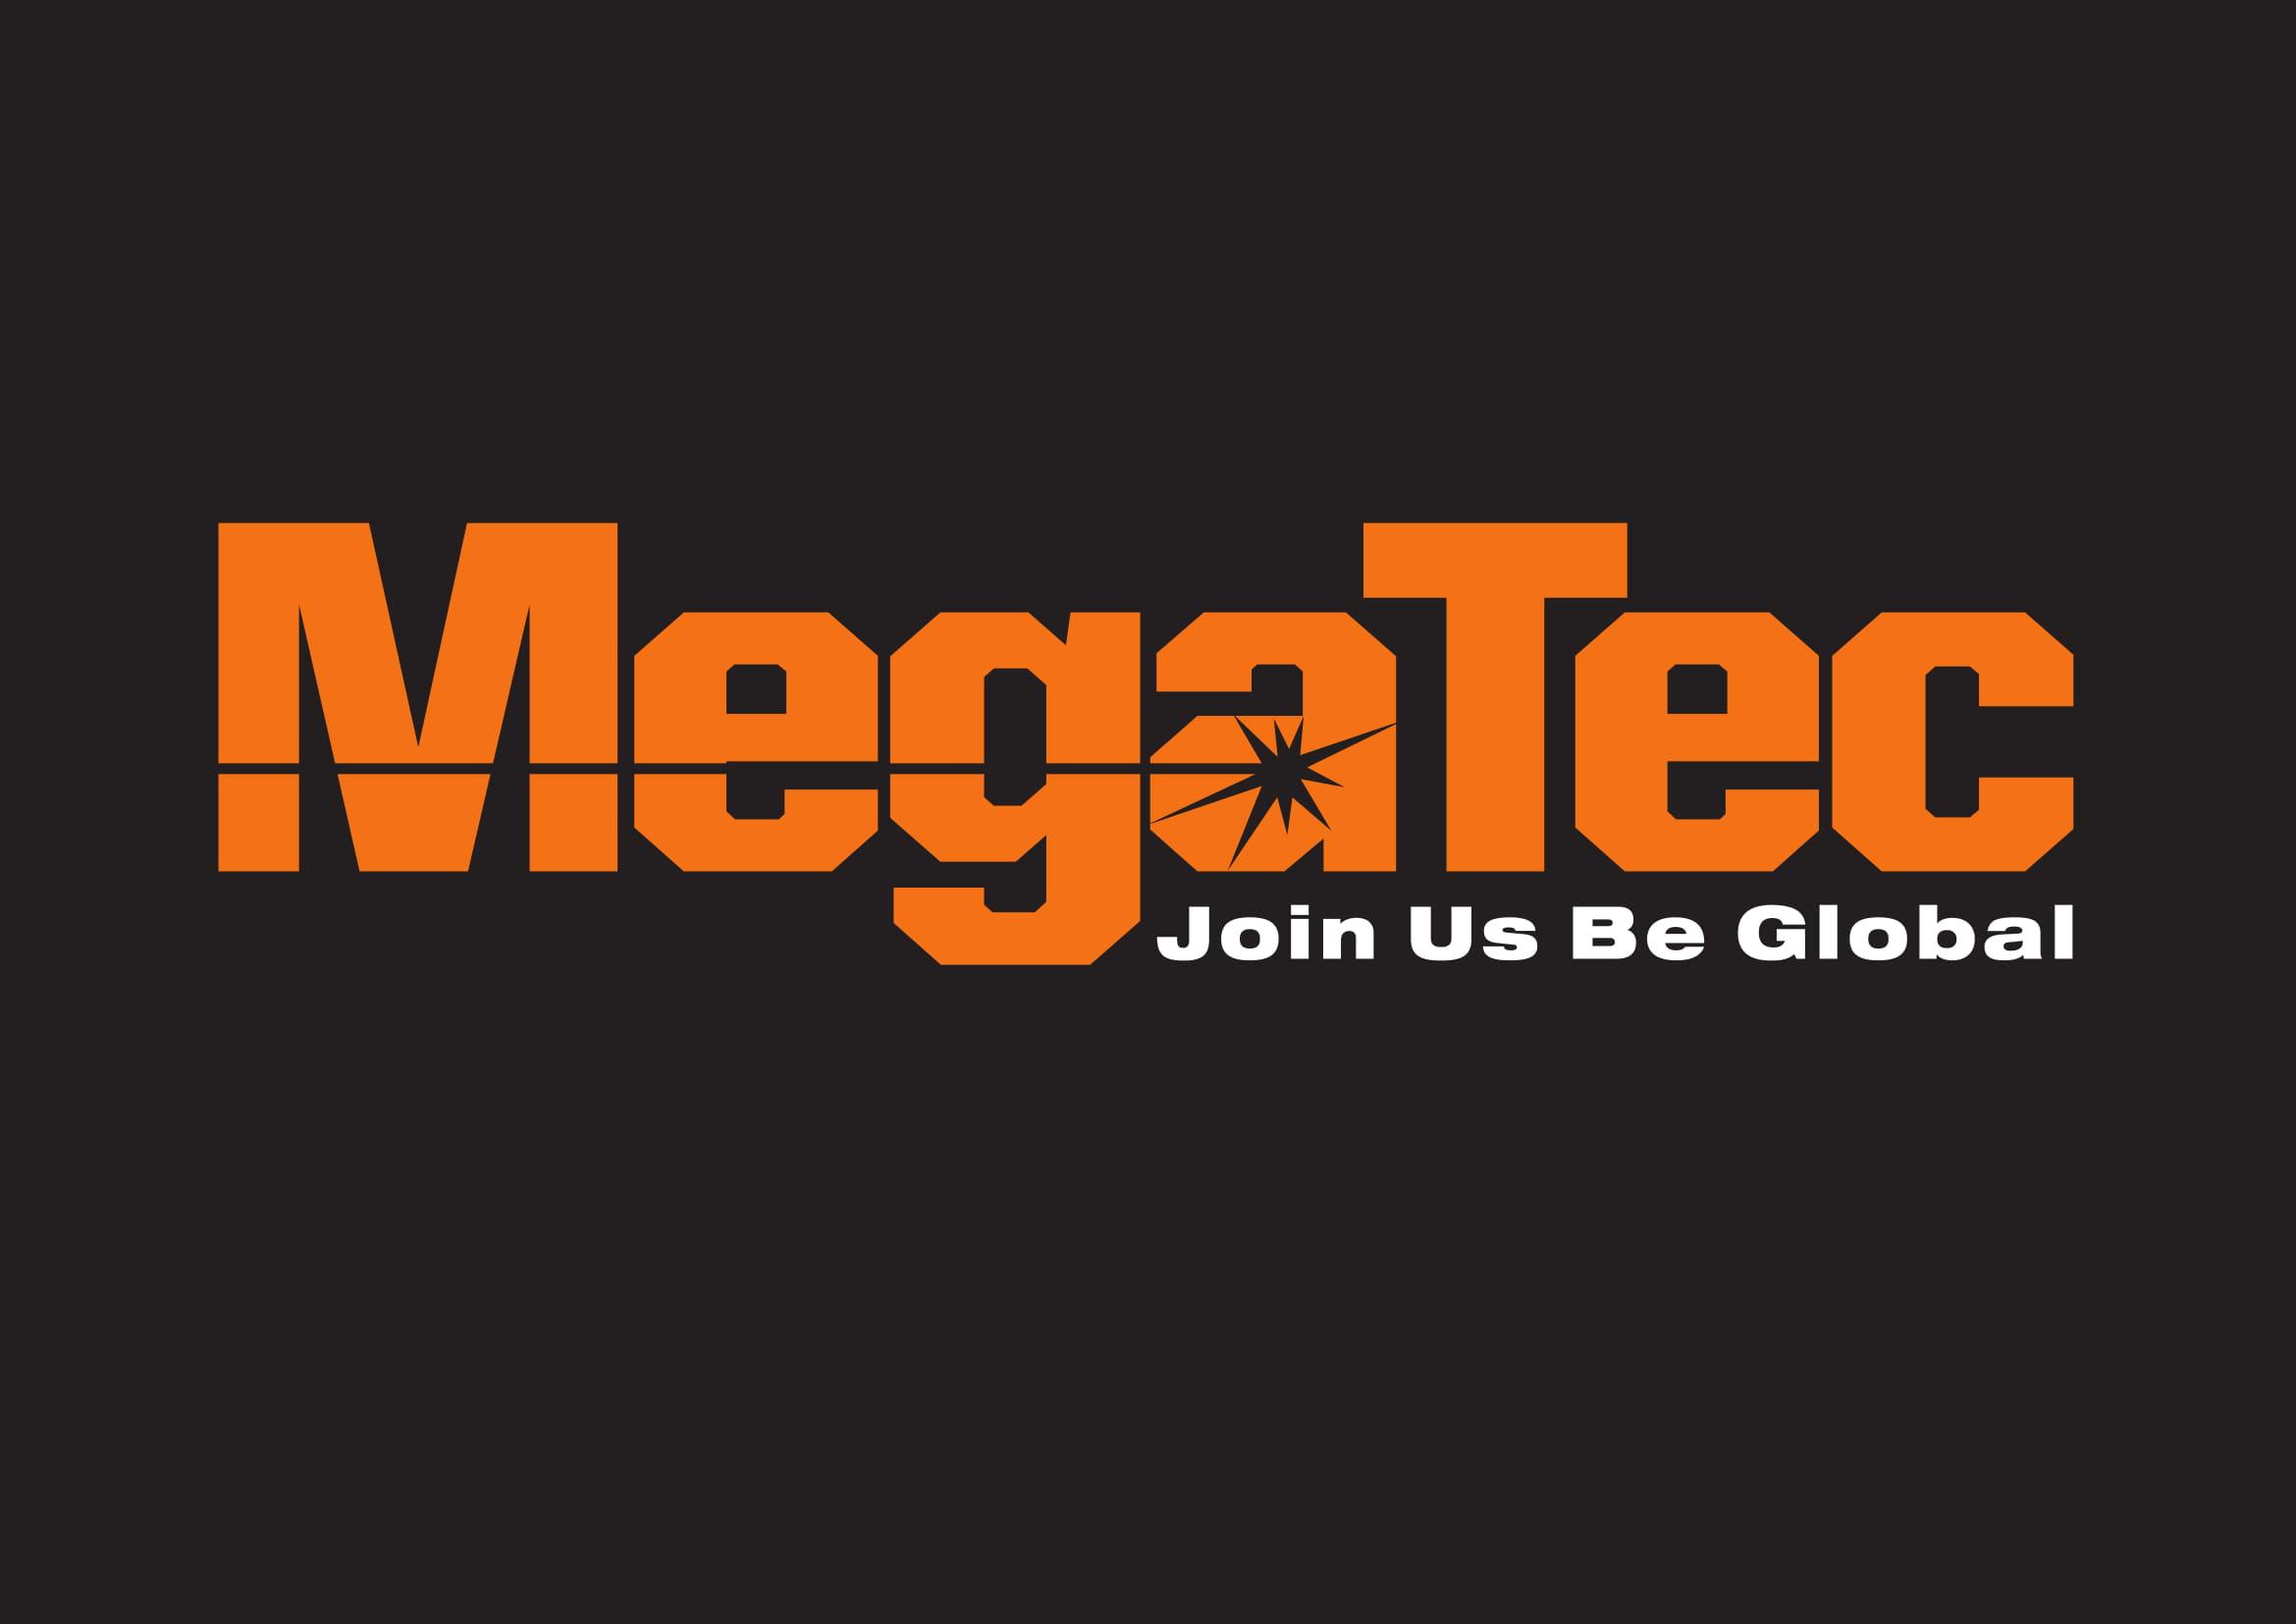 MegaTec